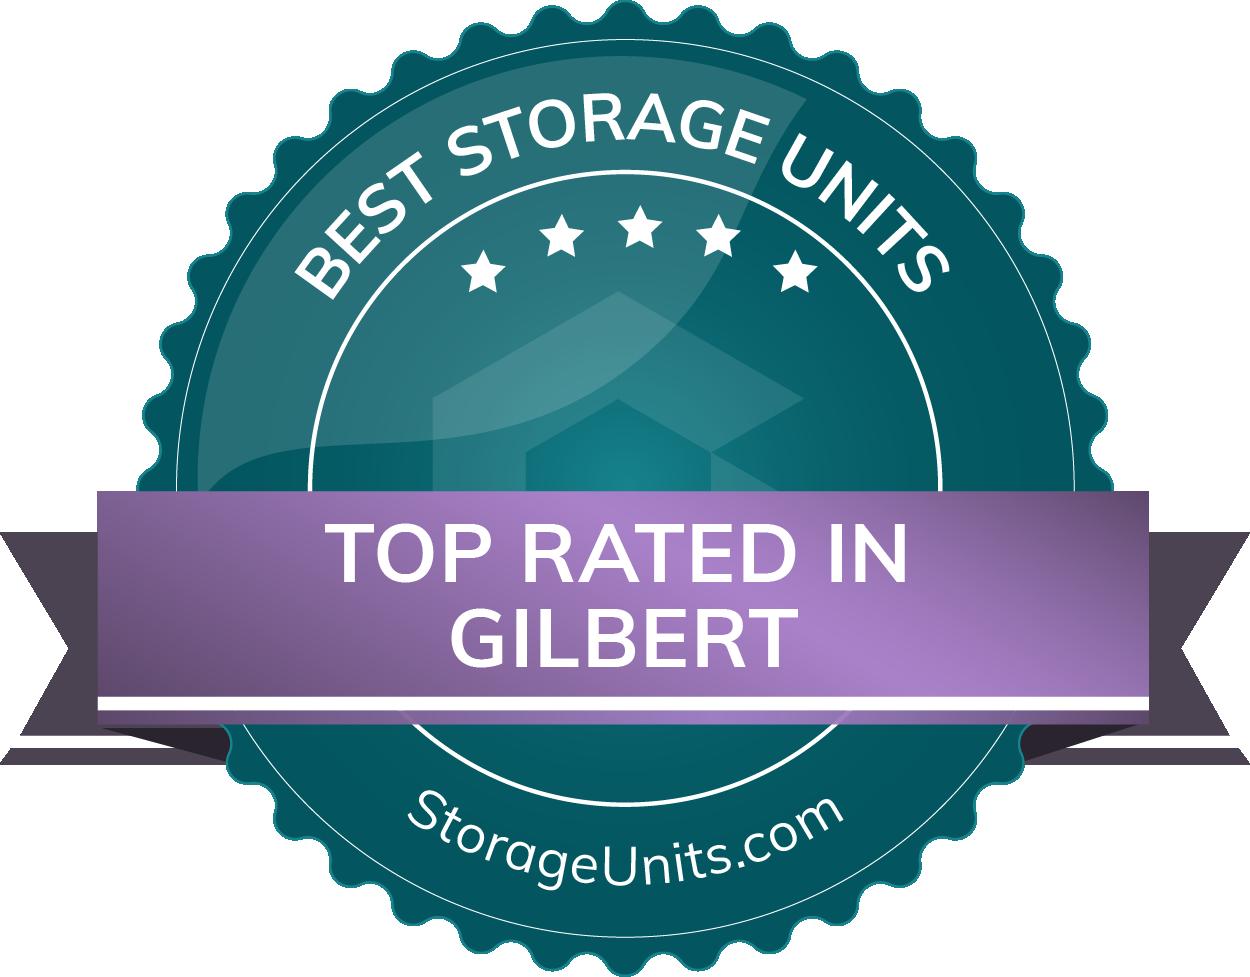 Best Self Storage Units in Gilbert, AZ